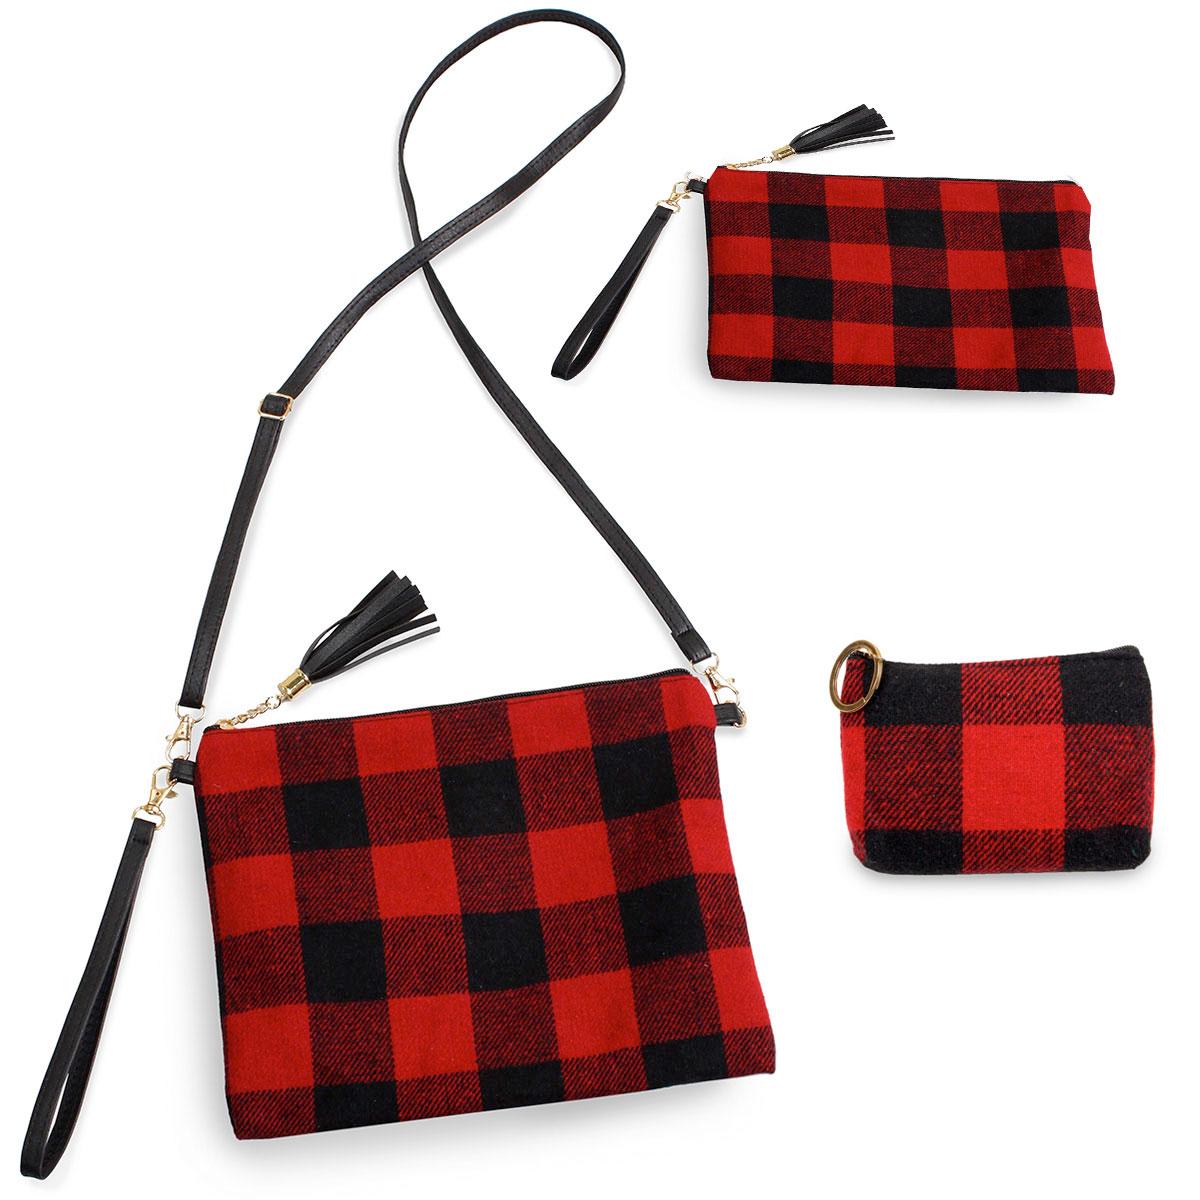 Crossbody Bags & Coin Purses - Plaids - 9882 Buffalo Check Red (Three Piece Set)